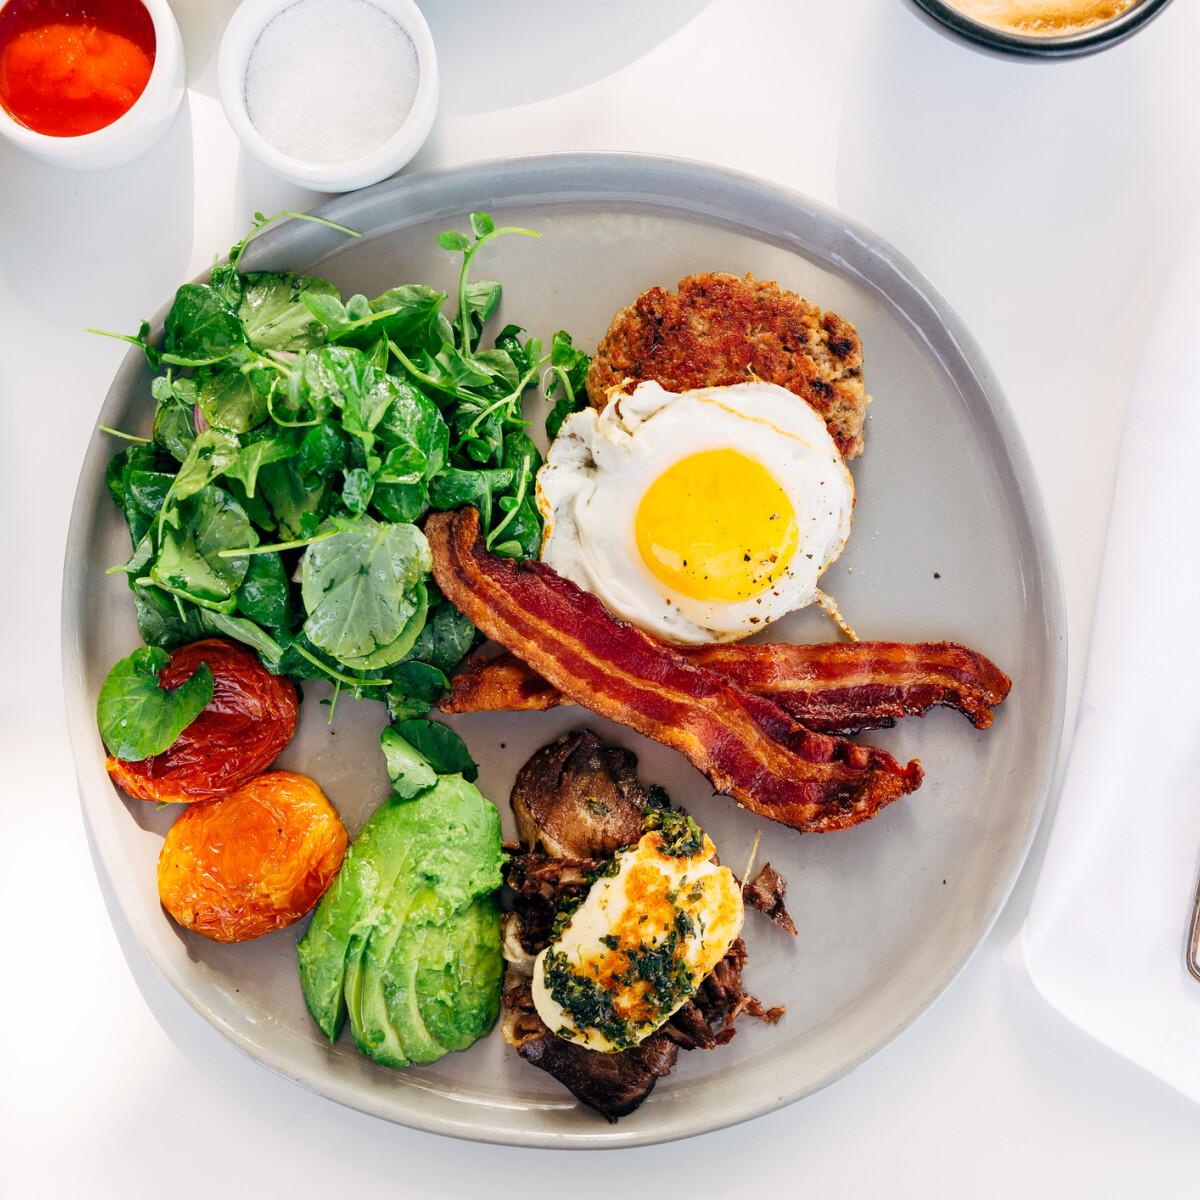 5 komoly probléma, amit a keto diéta is okozhat